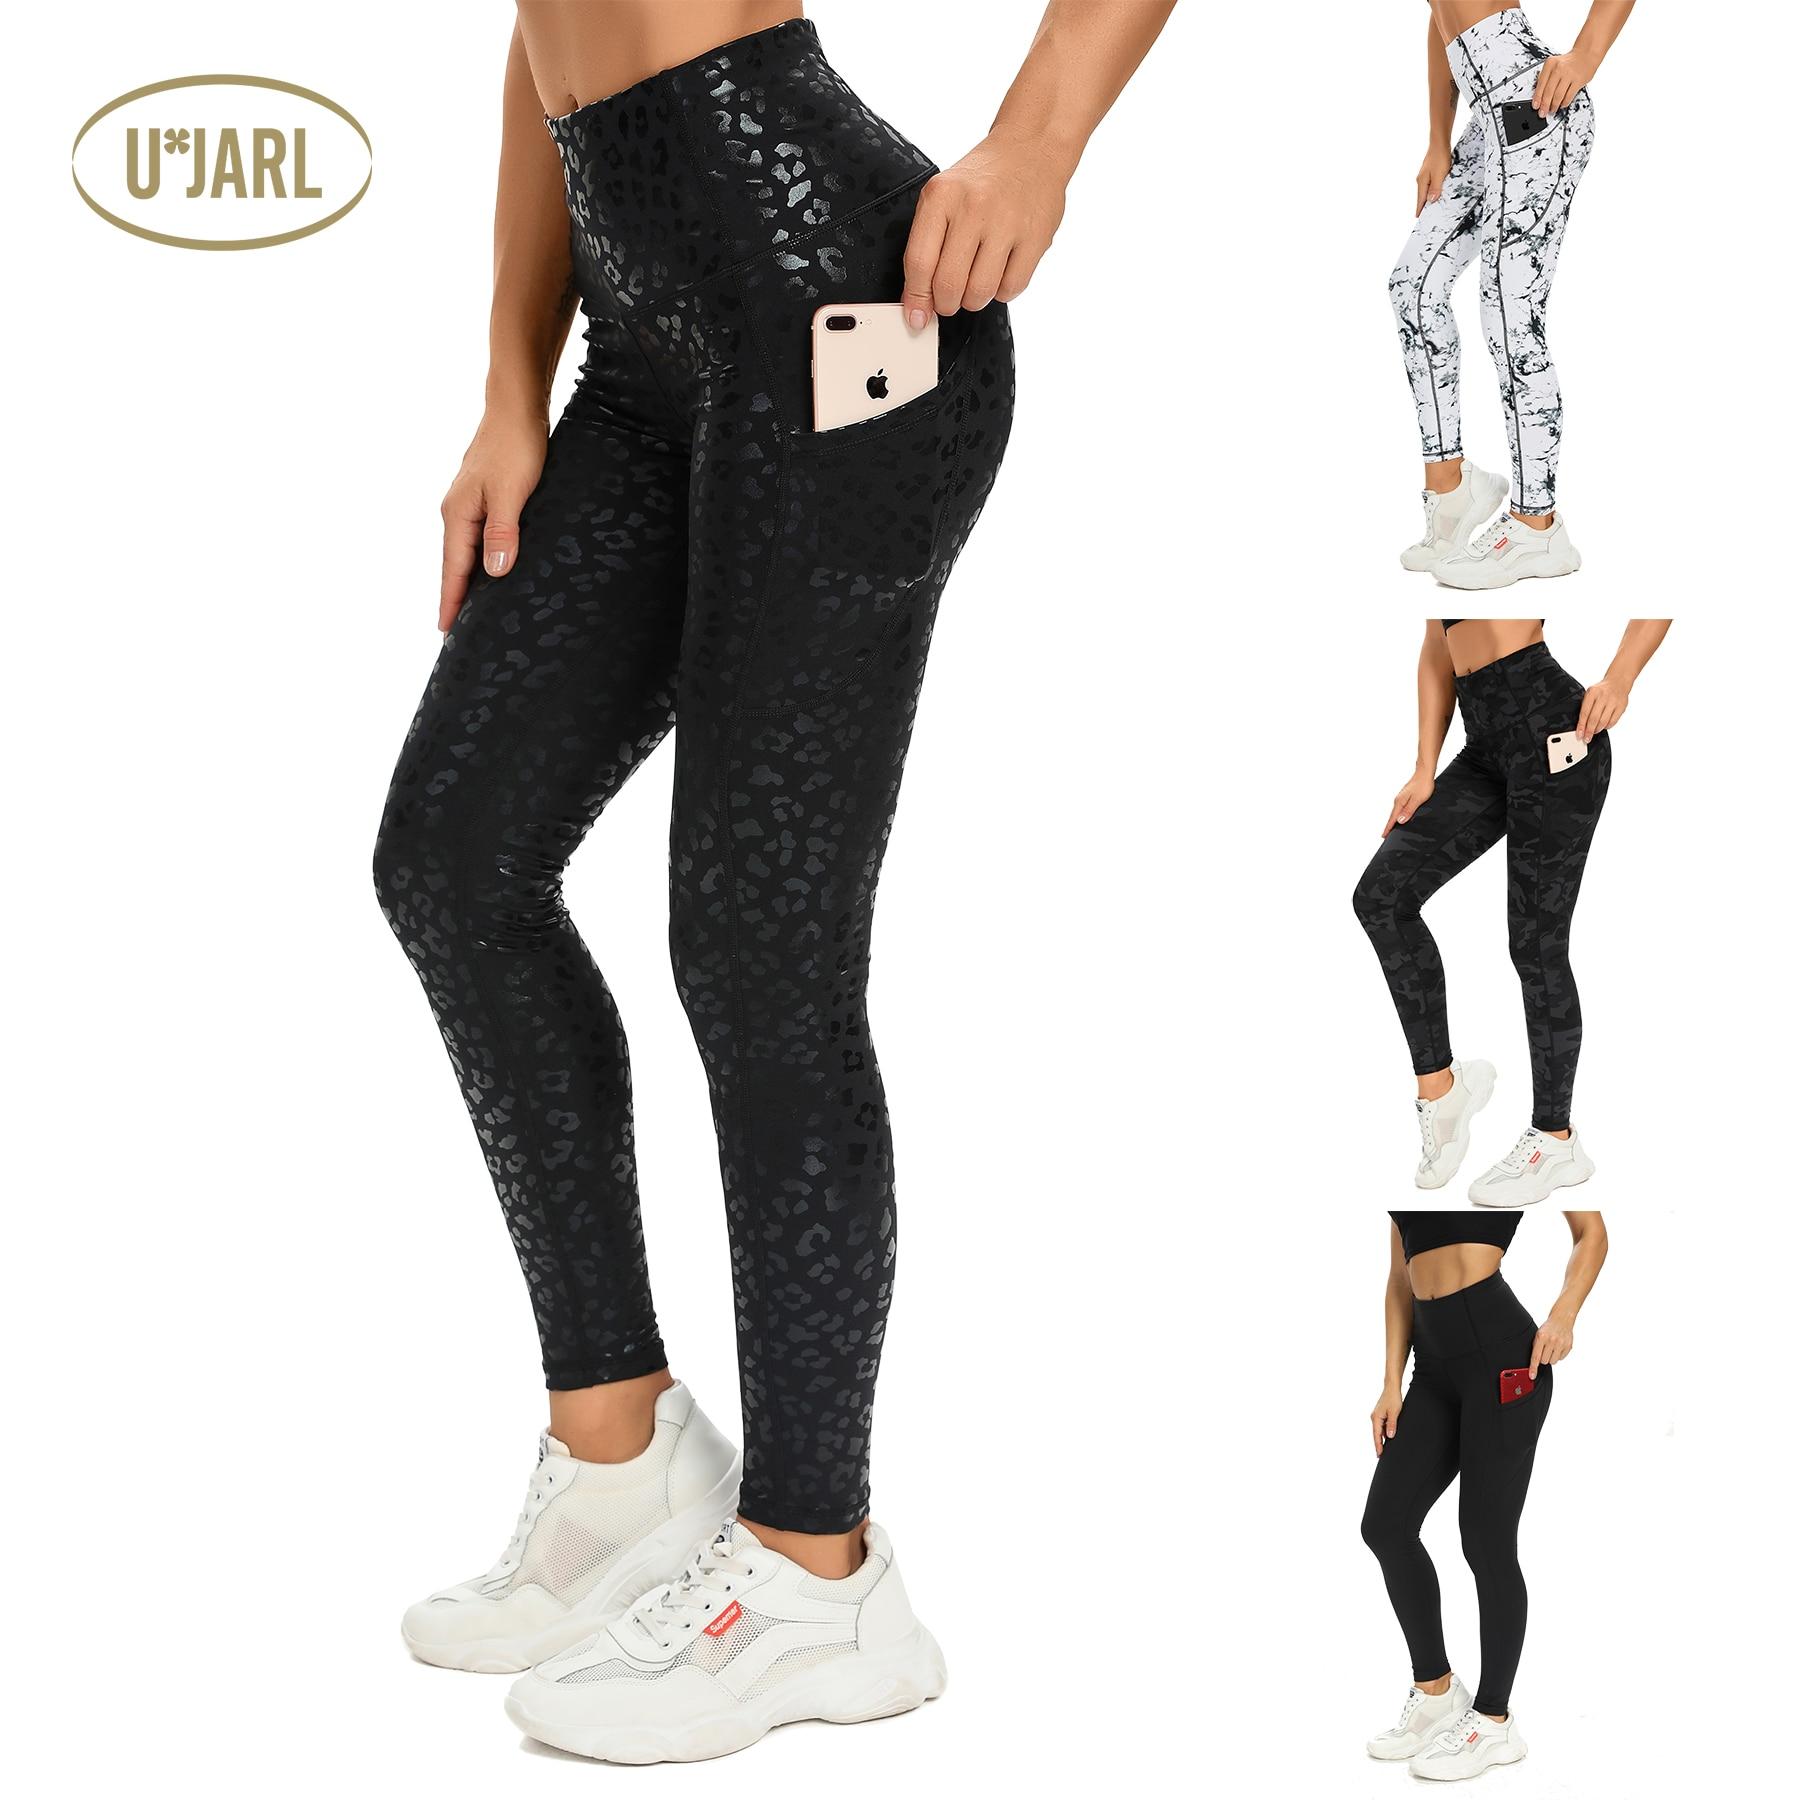 UxJARL 2021New Women Seamless Leggings High Waist Legging Workout Running Activewear Yoga Pant Sport